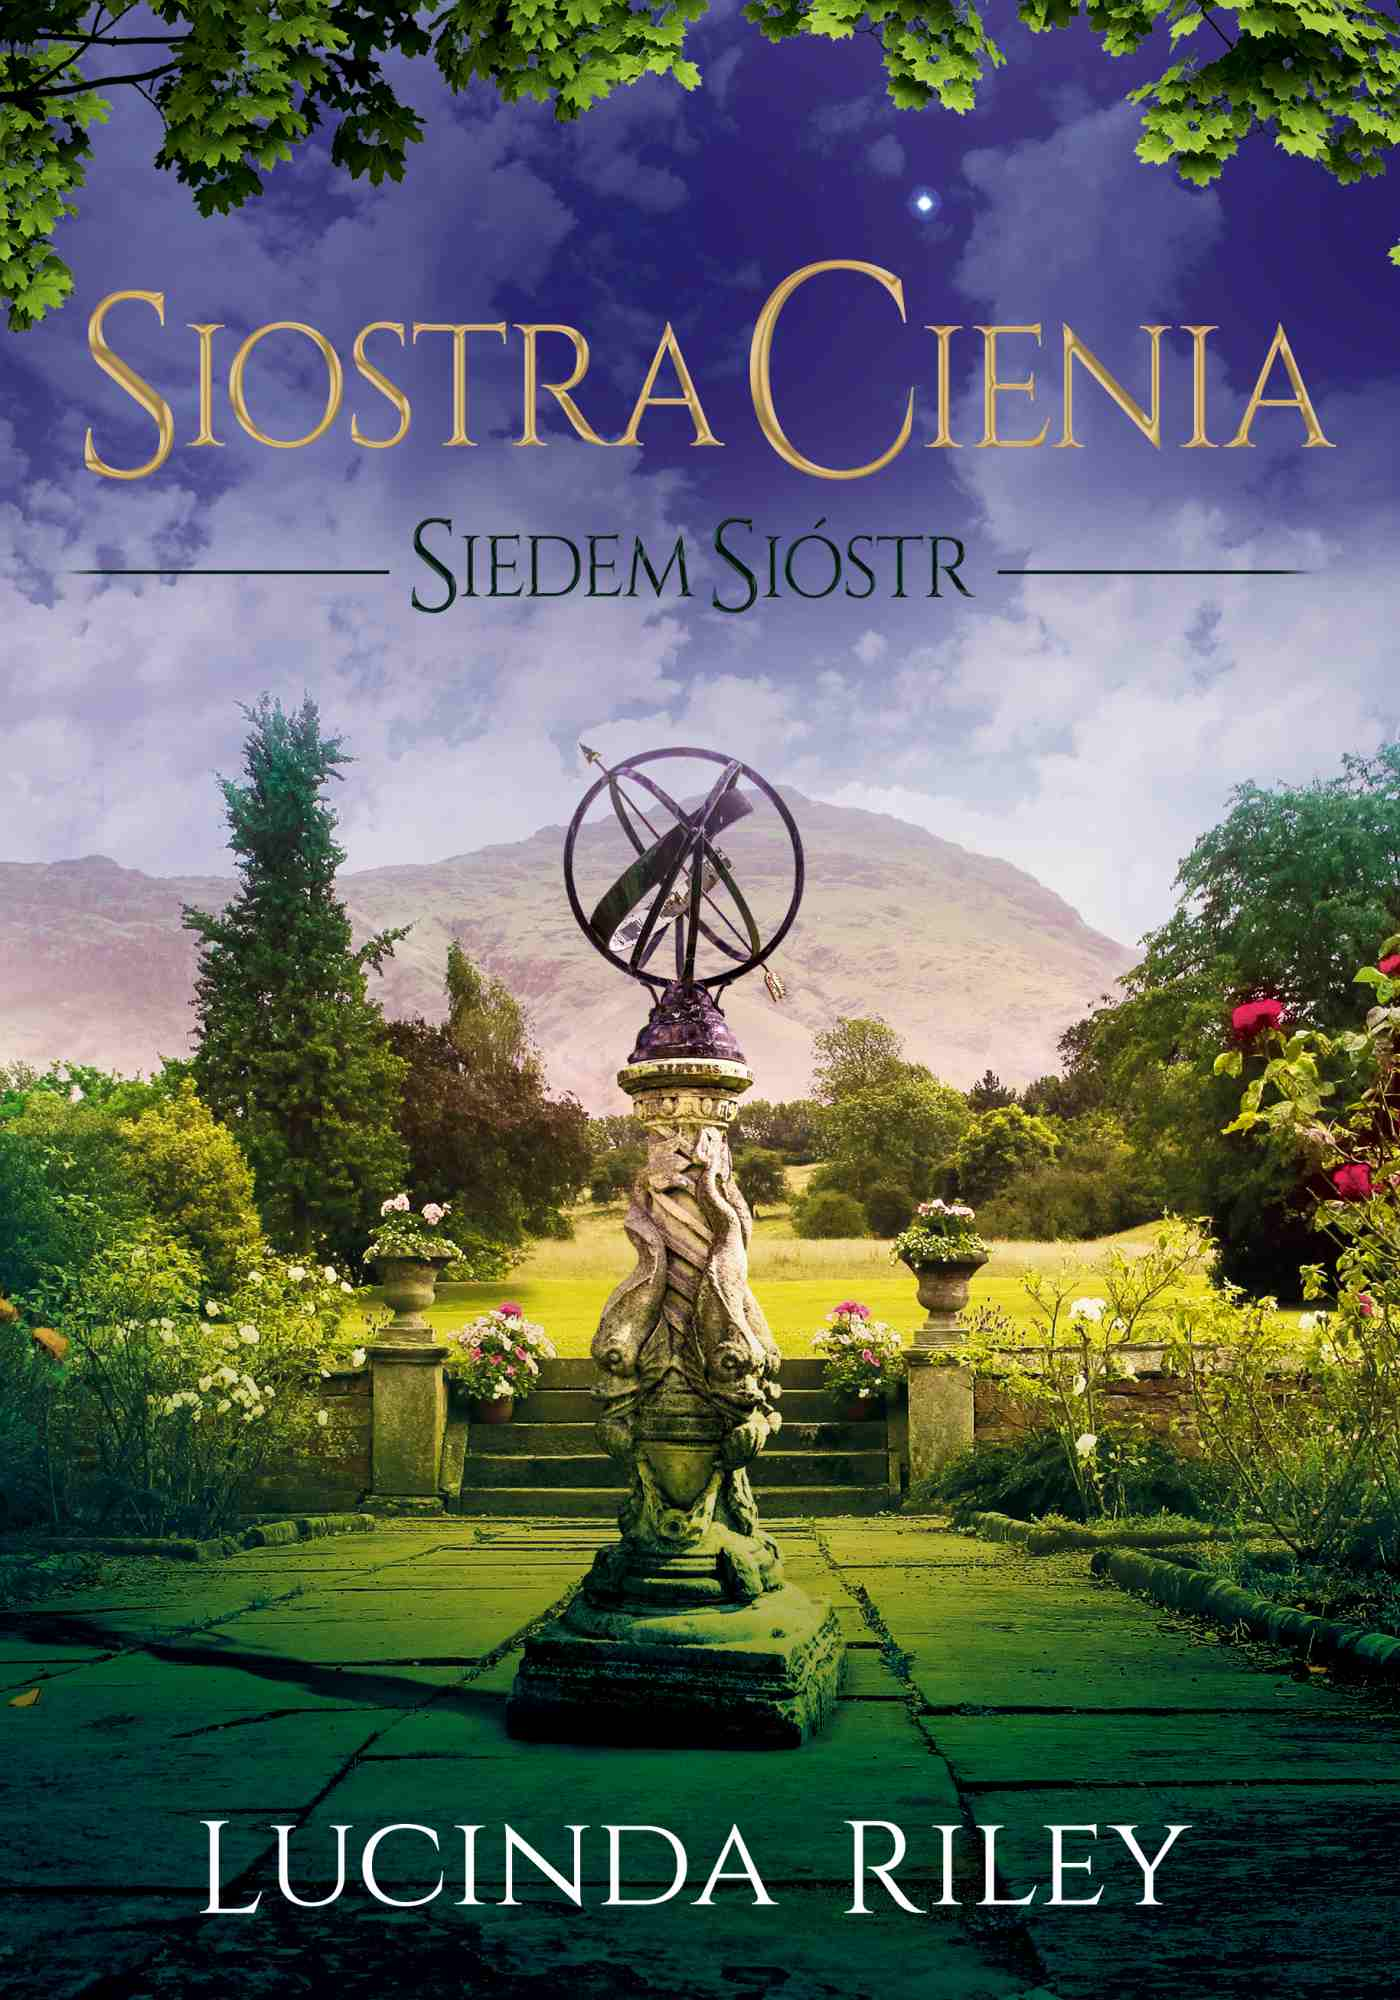 Siostra Cienia. Siedem Sióstr - Ebook (Książka na Kindle) do pobrania w formacie MOBI